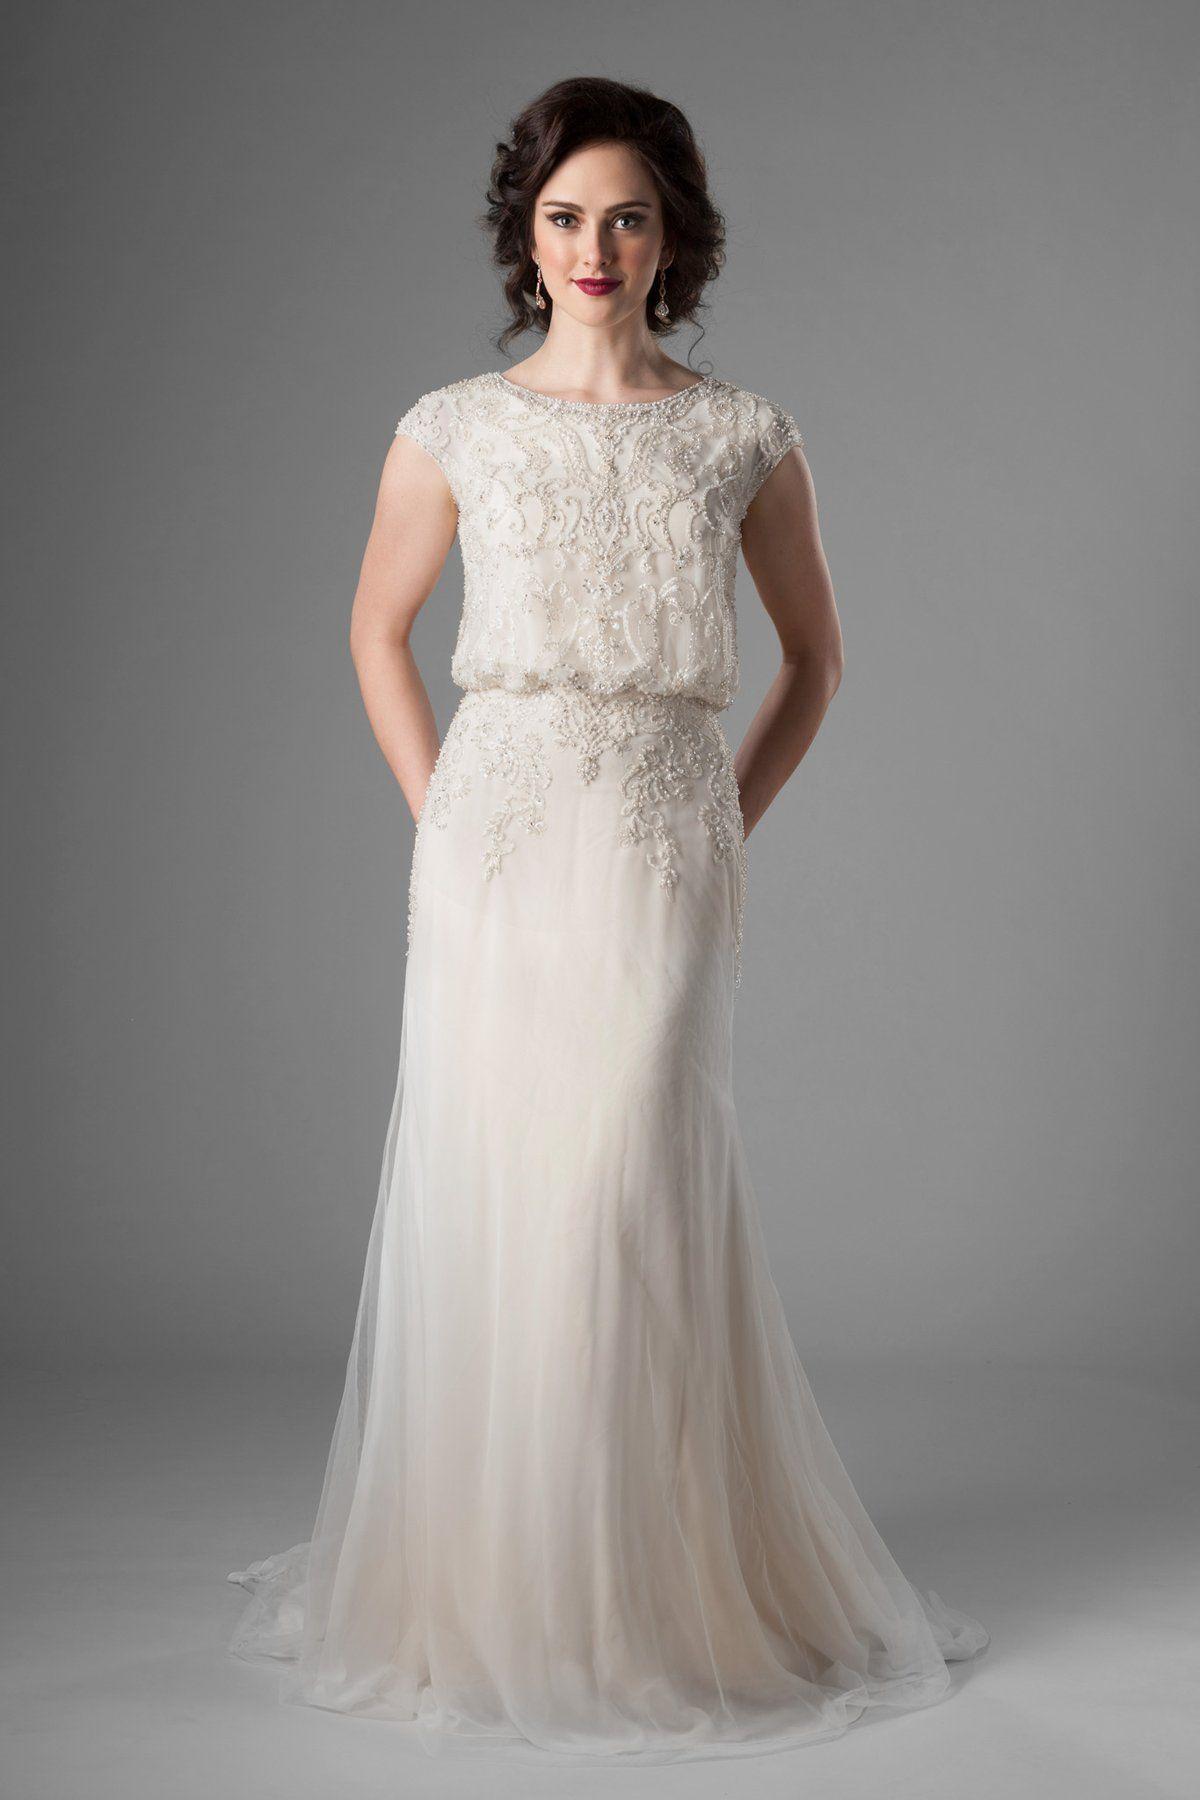 Wedding dresses, Modest wedding gowns